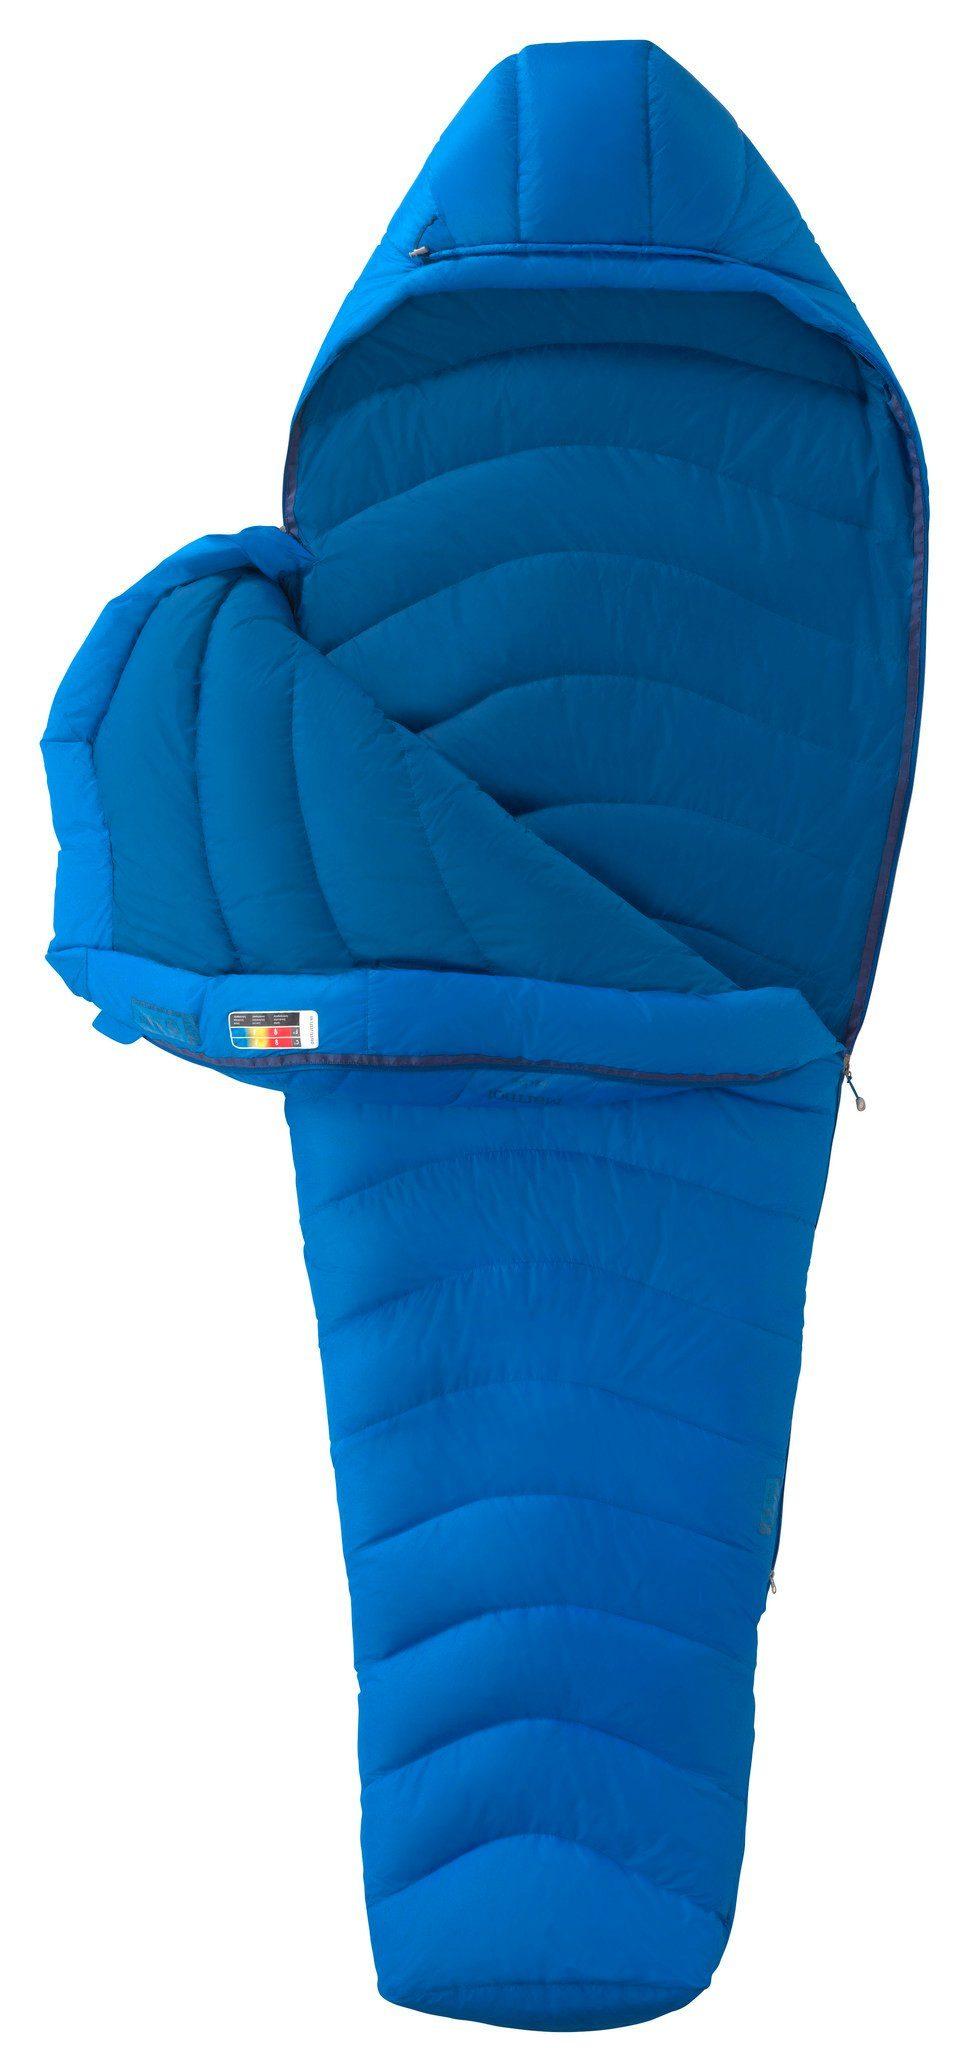 Marmot Wanderrucksack »Helium Sleeping Bag regular«